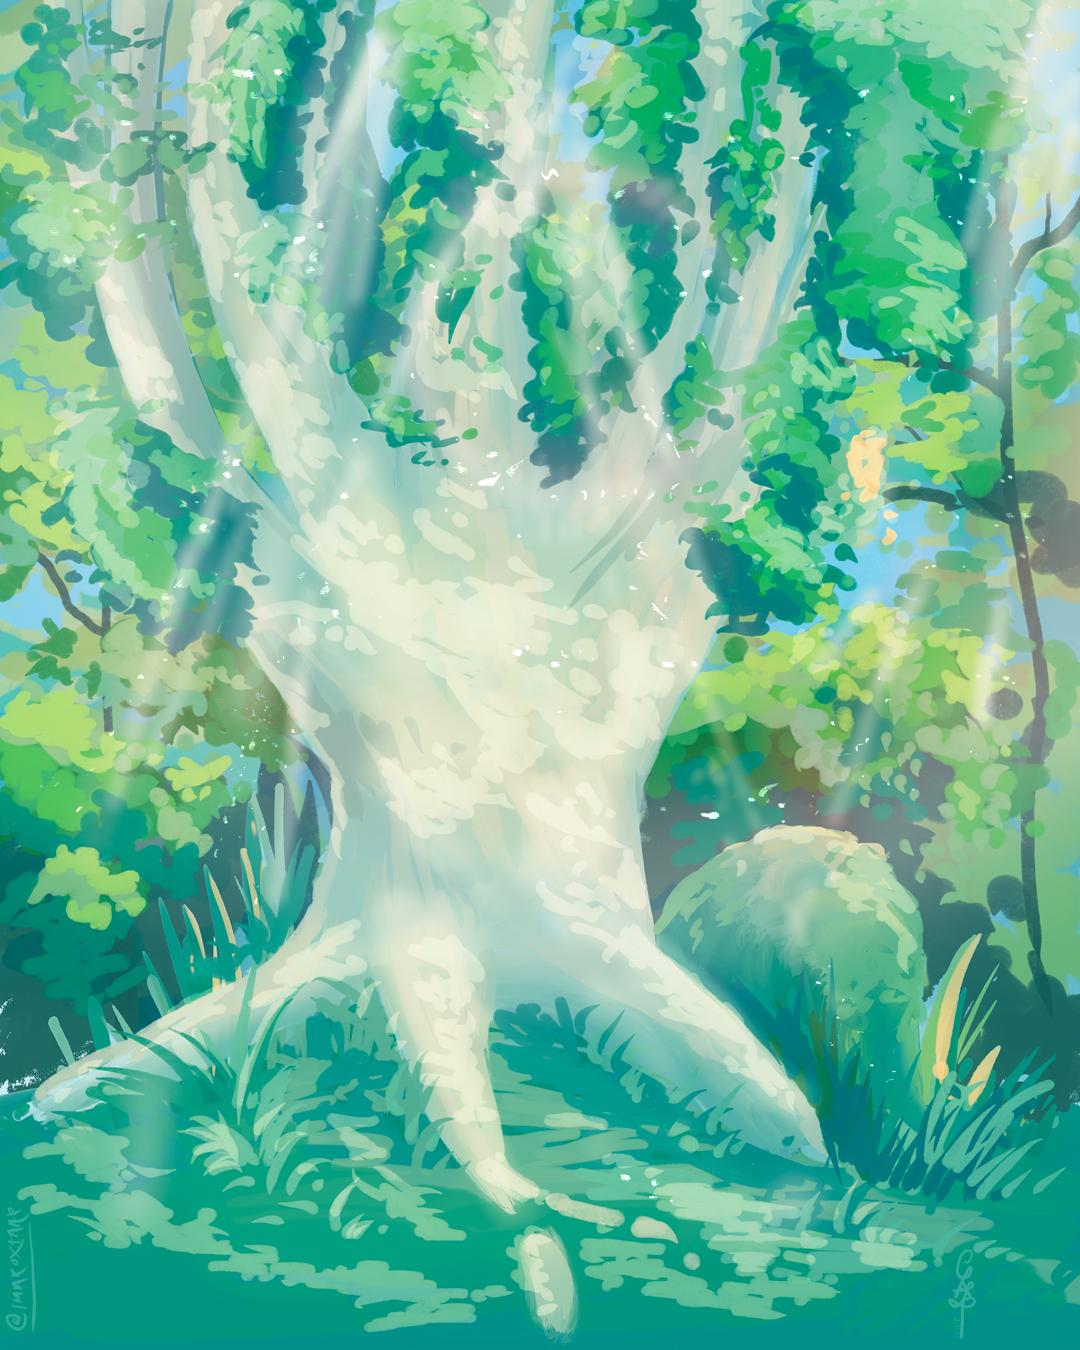 Forest World No.5 ' | ' Forest World Series